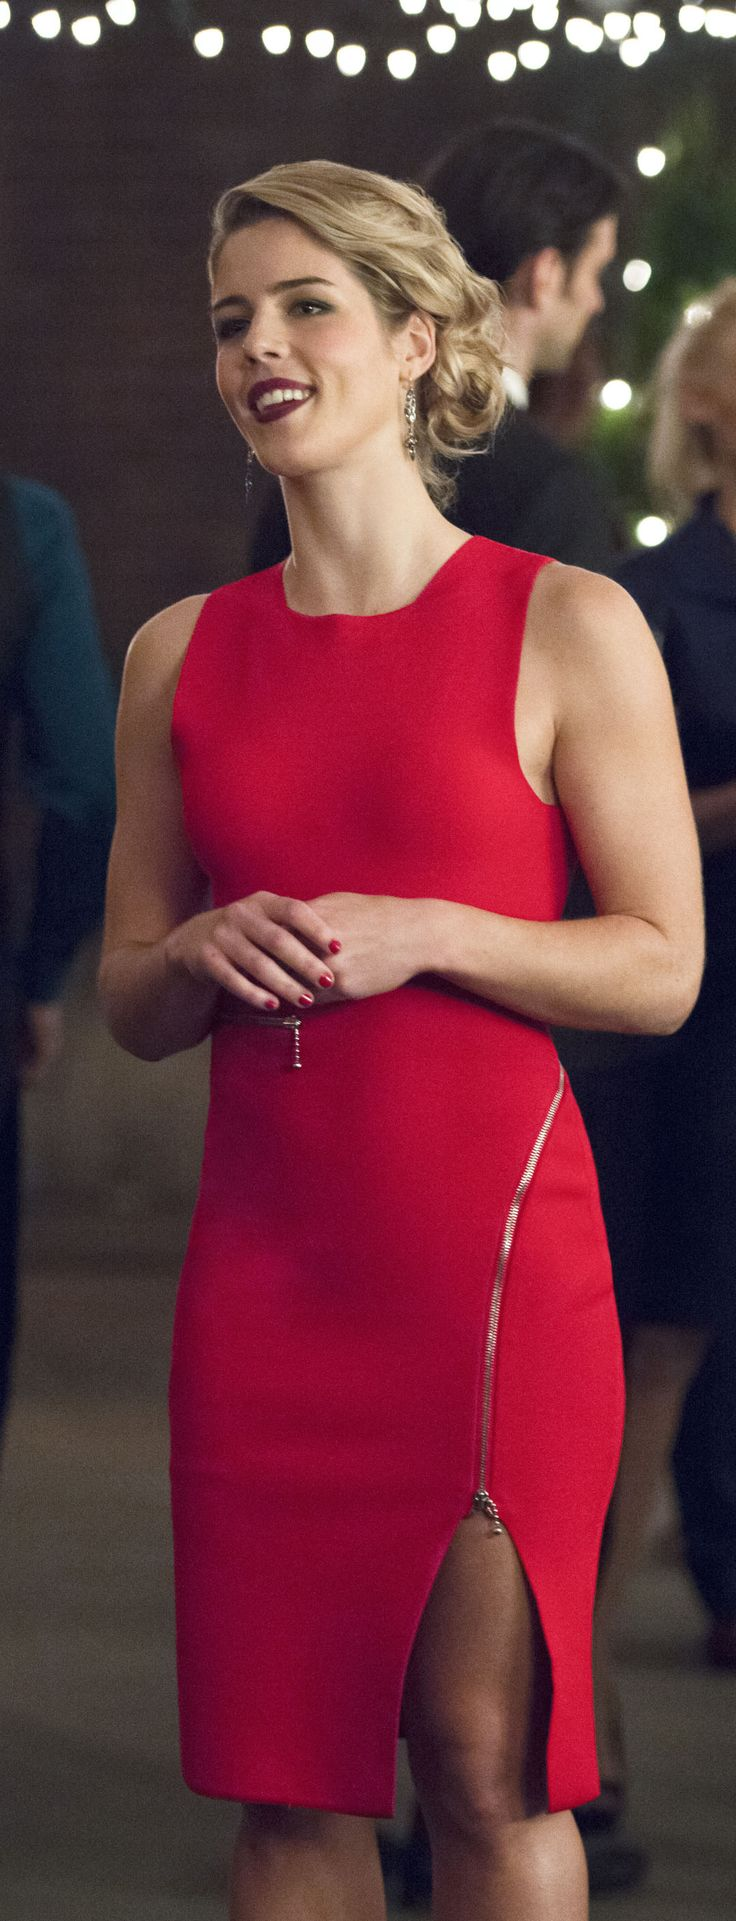 Arrow 4x09 - Felicity Smoak